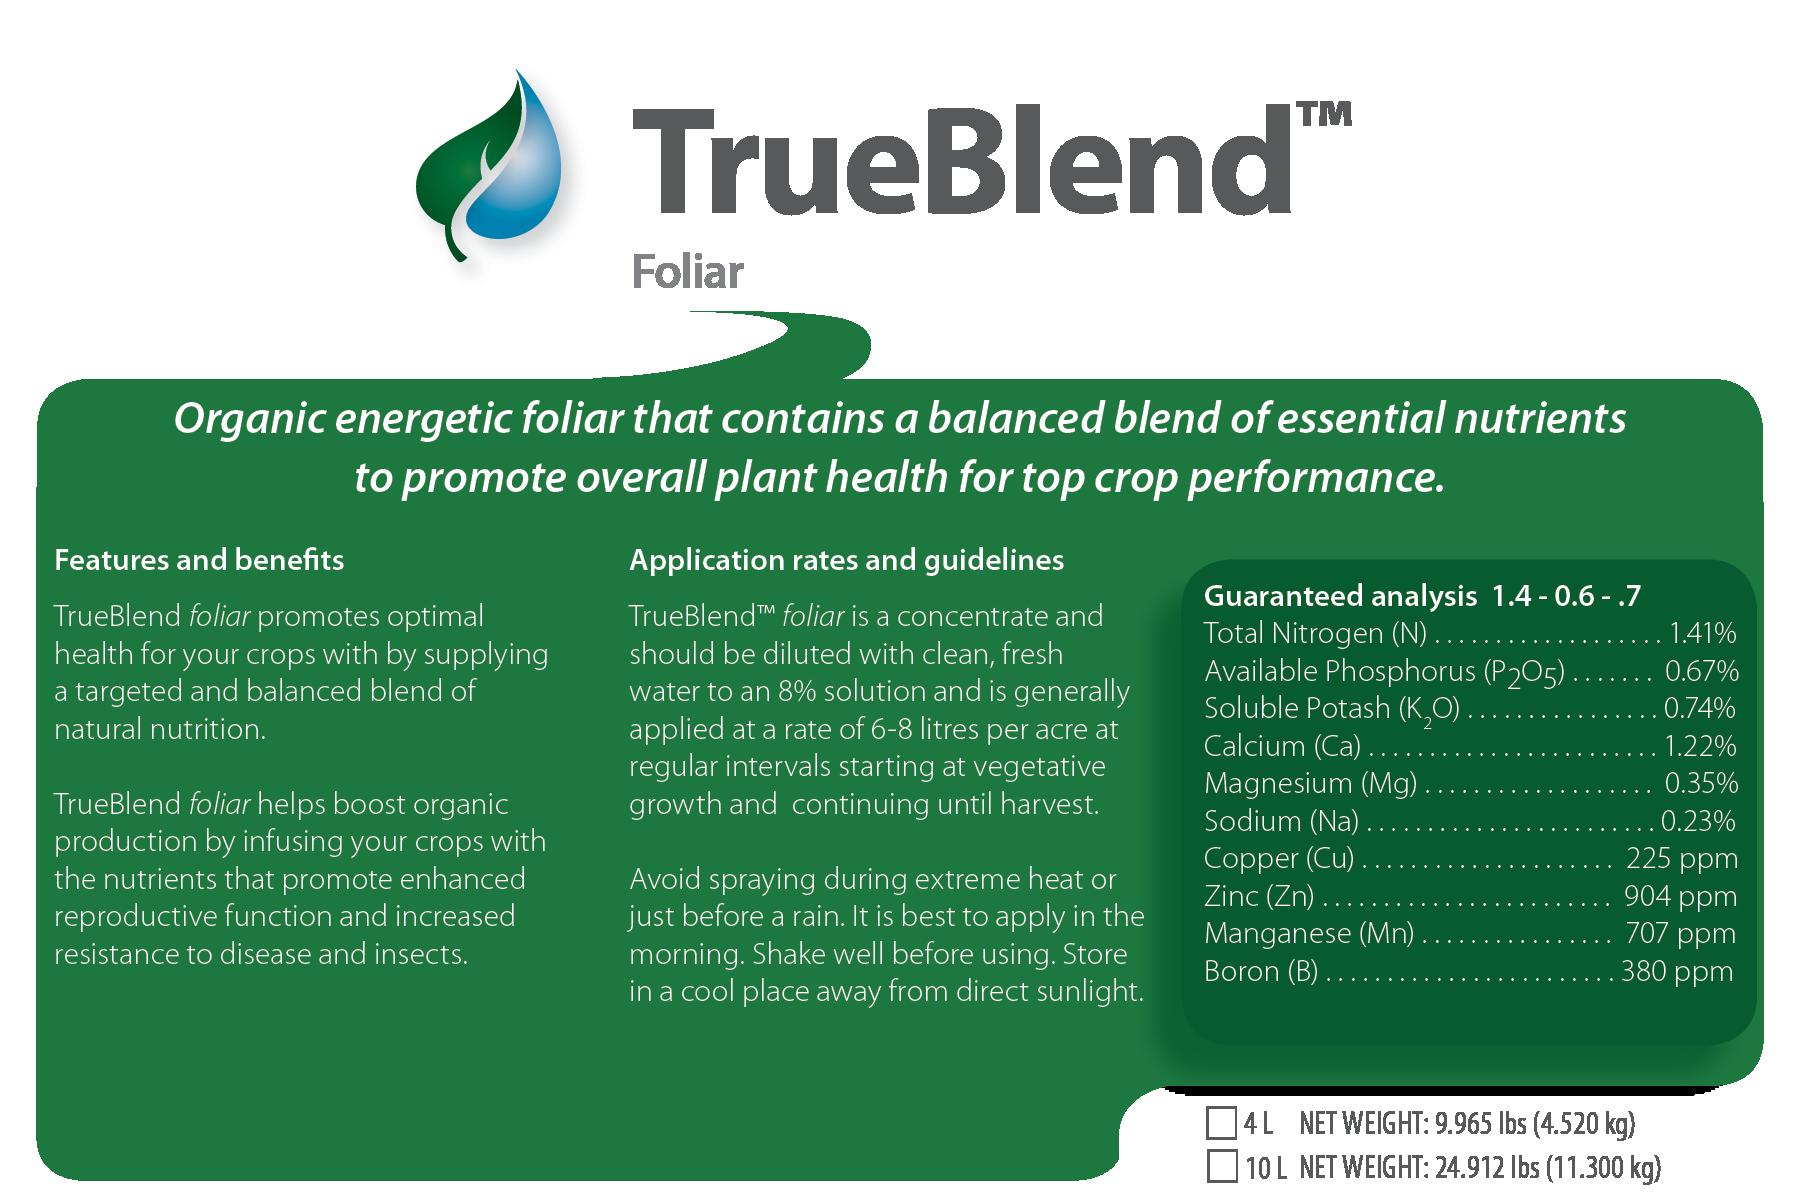 TrueBlend Foliar